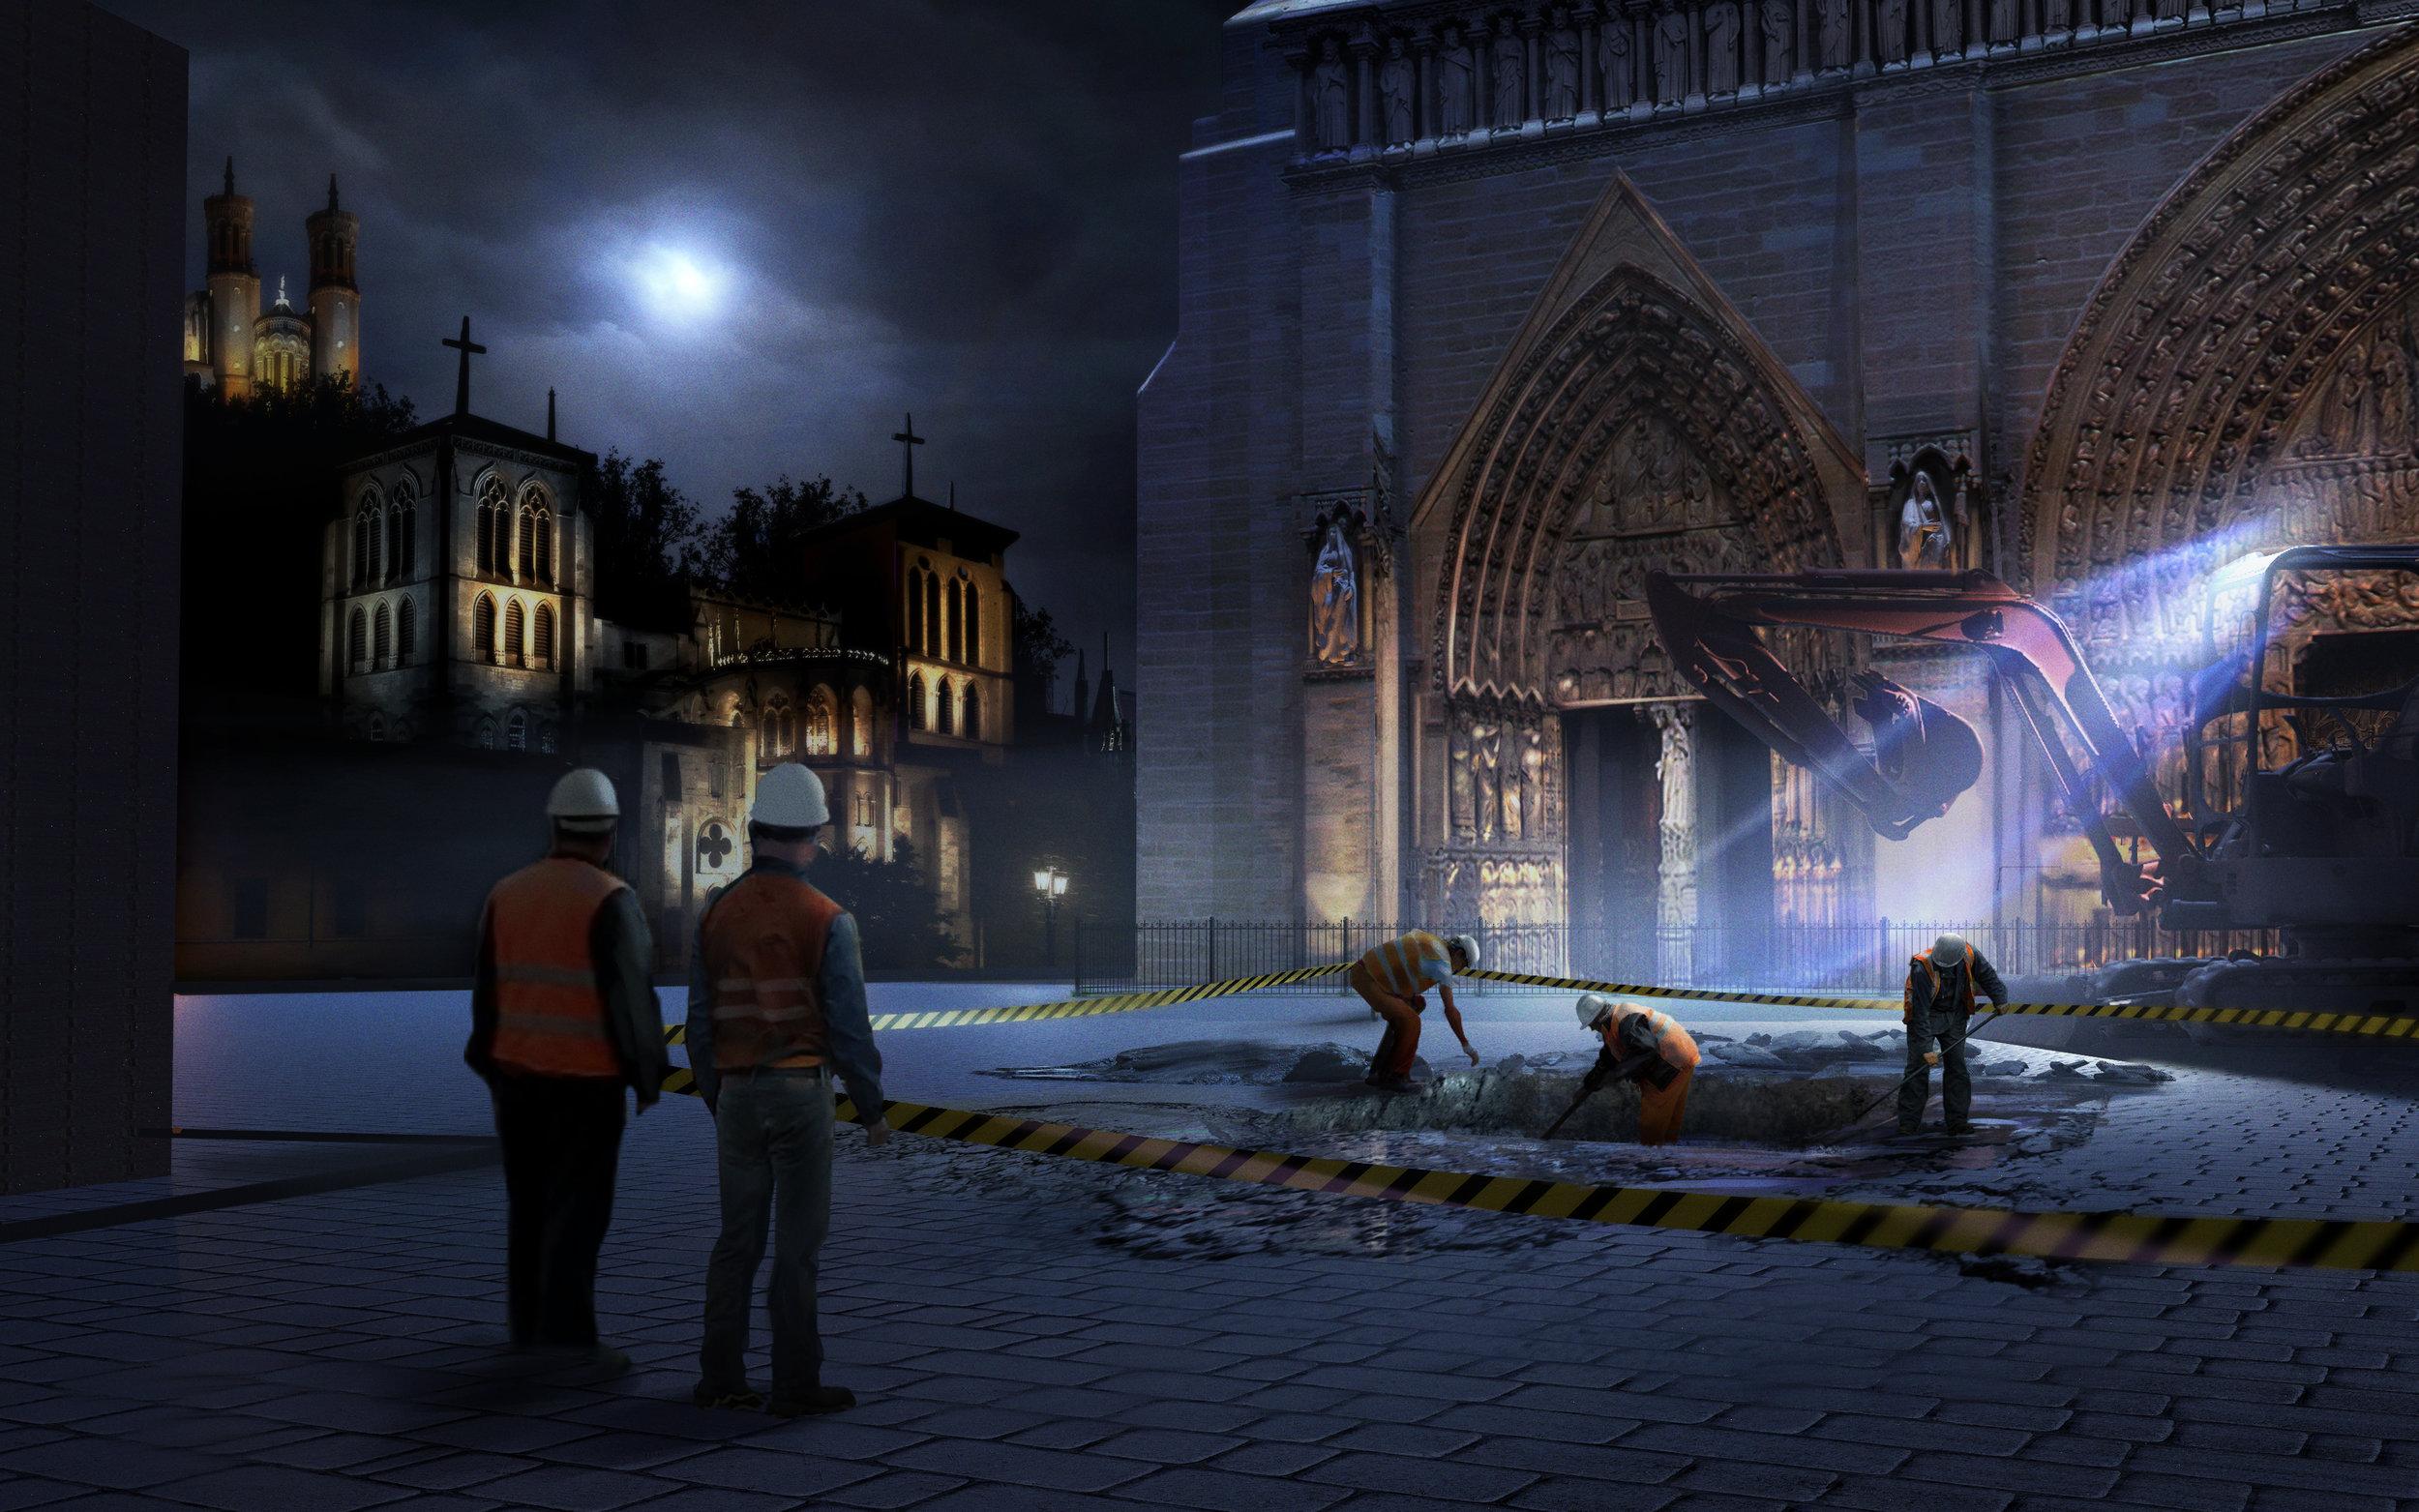 OPENING SCENE ACT I Excavation pit where they discover Esmeralda's skeleton.